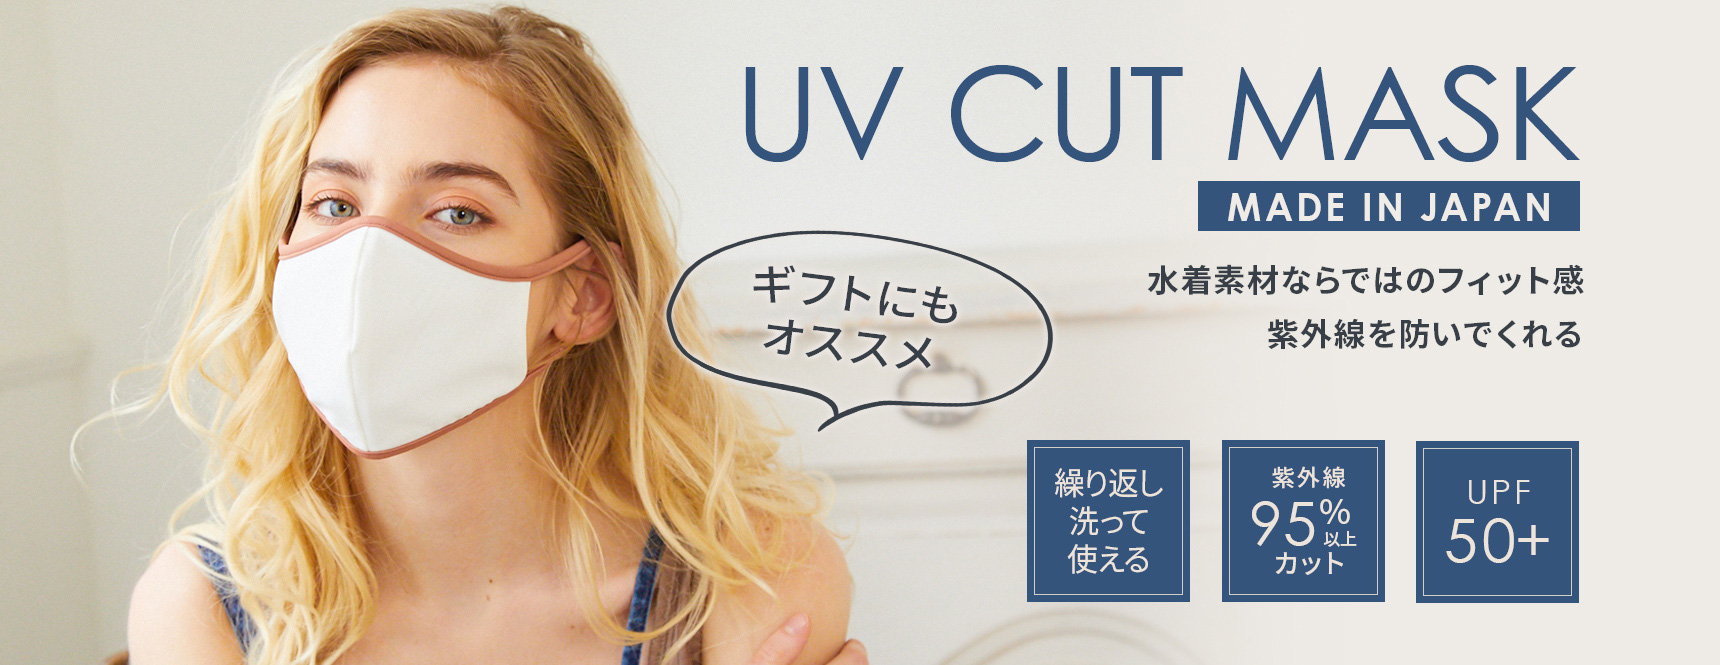 UV CUT MASK 水着ならではのフィット感、紫外線を防いでくれる UPF50+ 紫外線95%以上カット 繰り返し洗って使える日本製